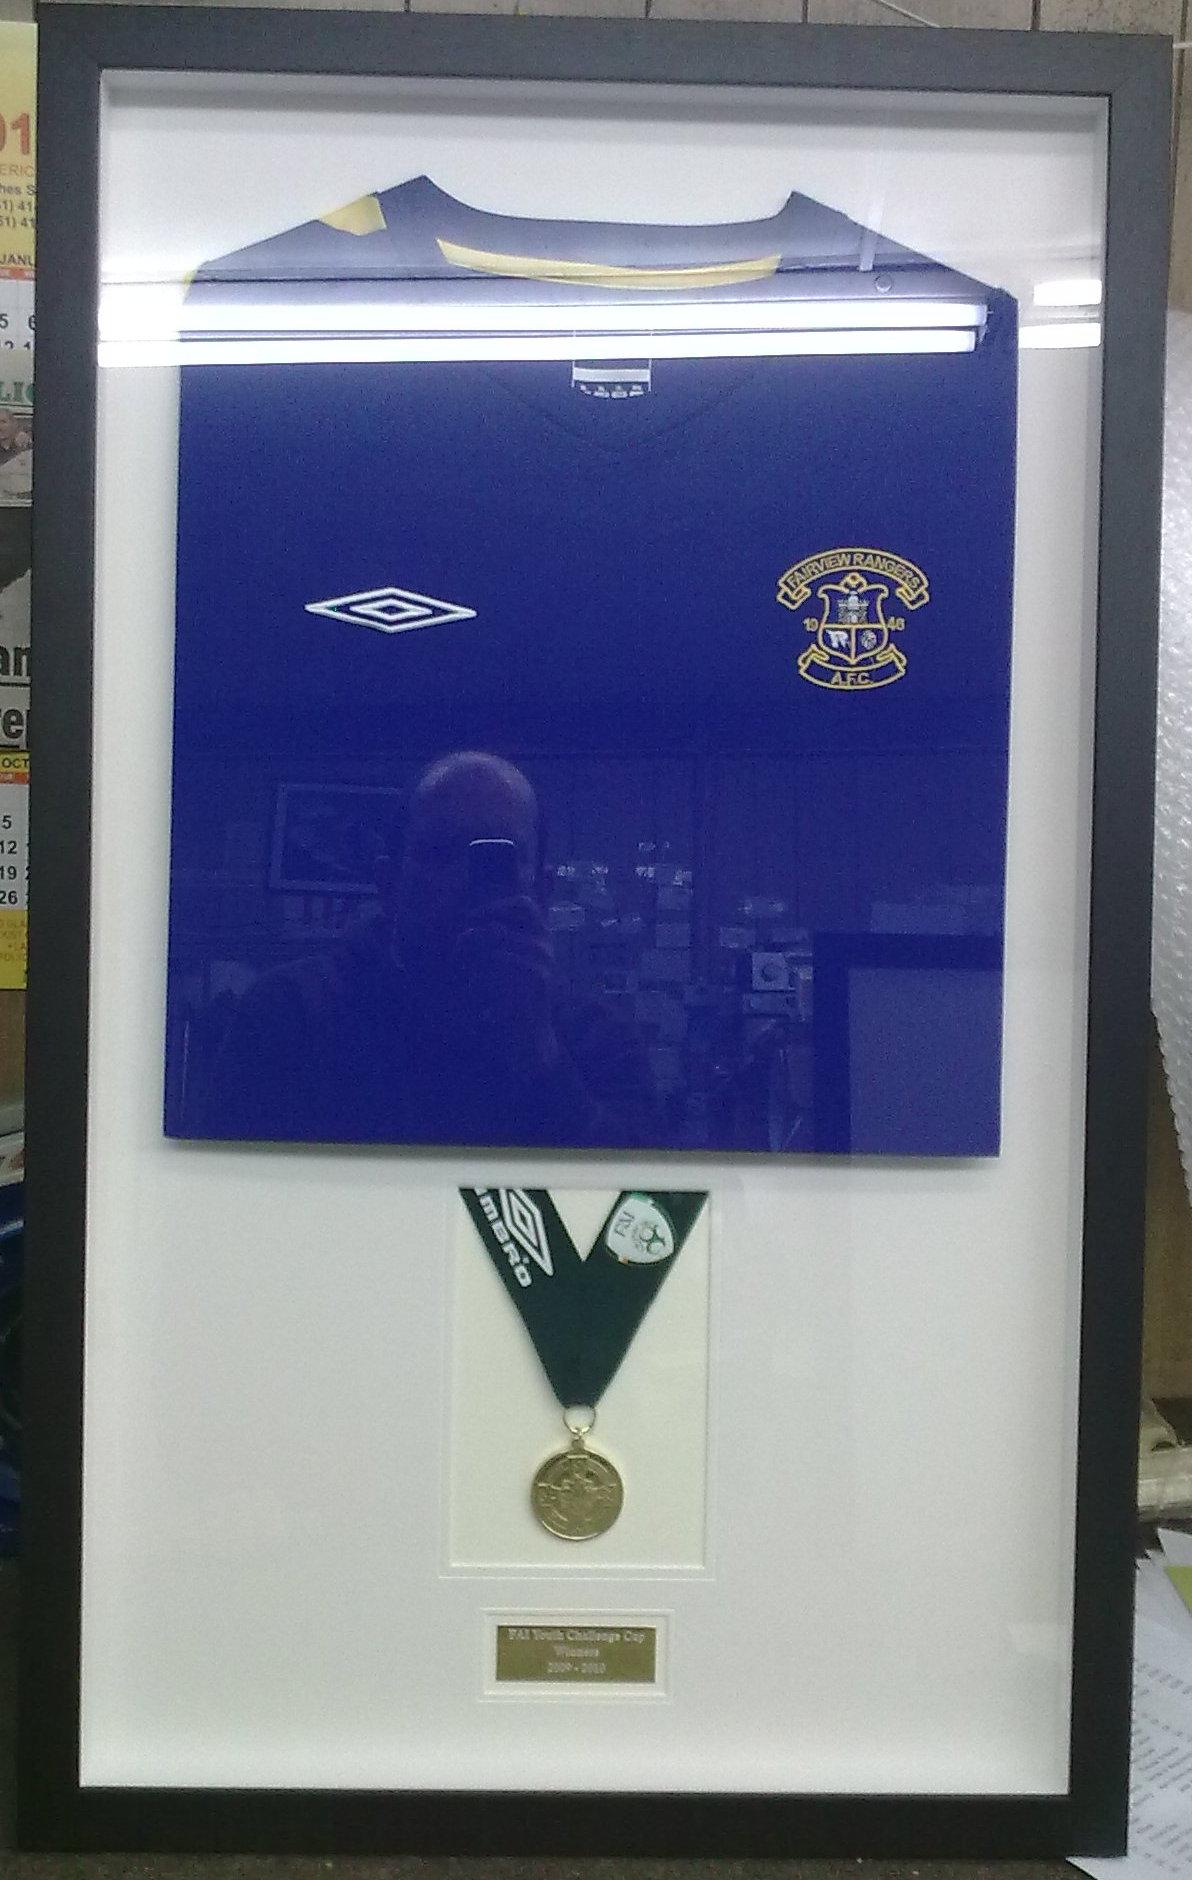 Framed  jersey and medal